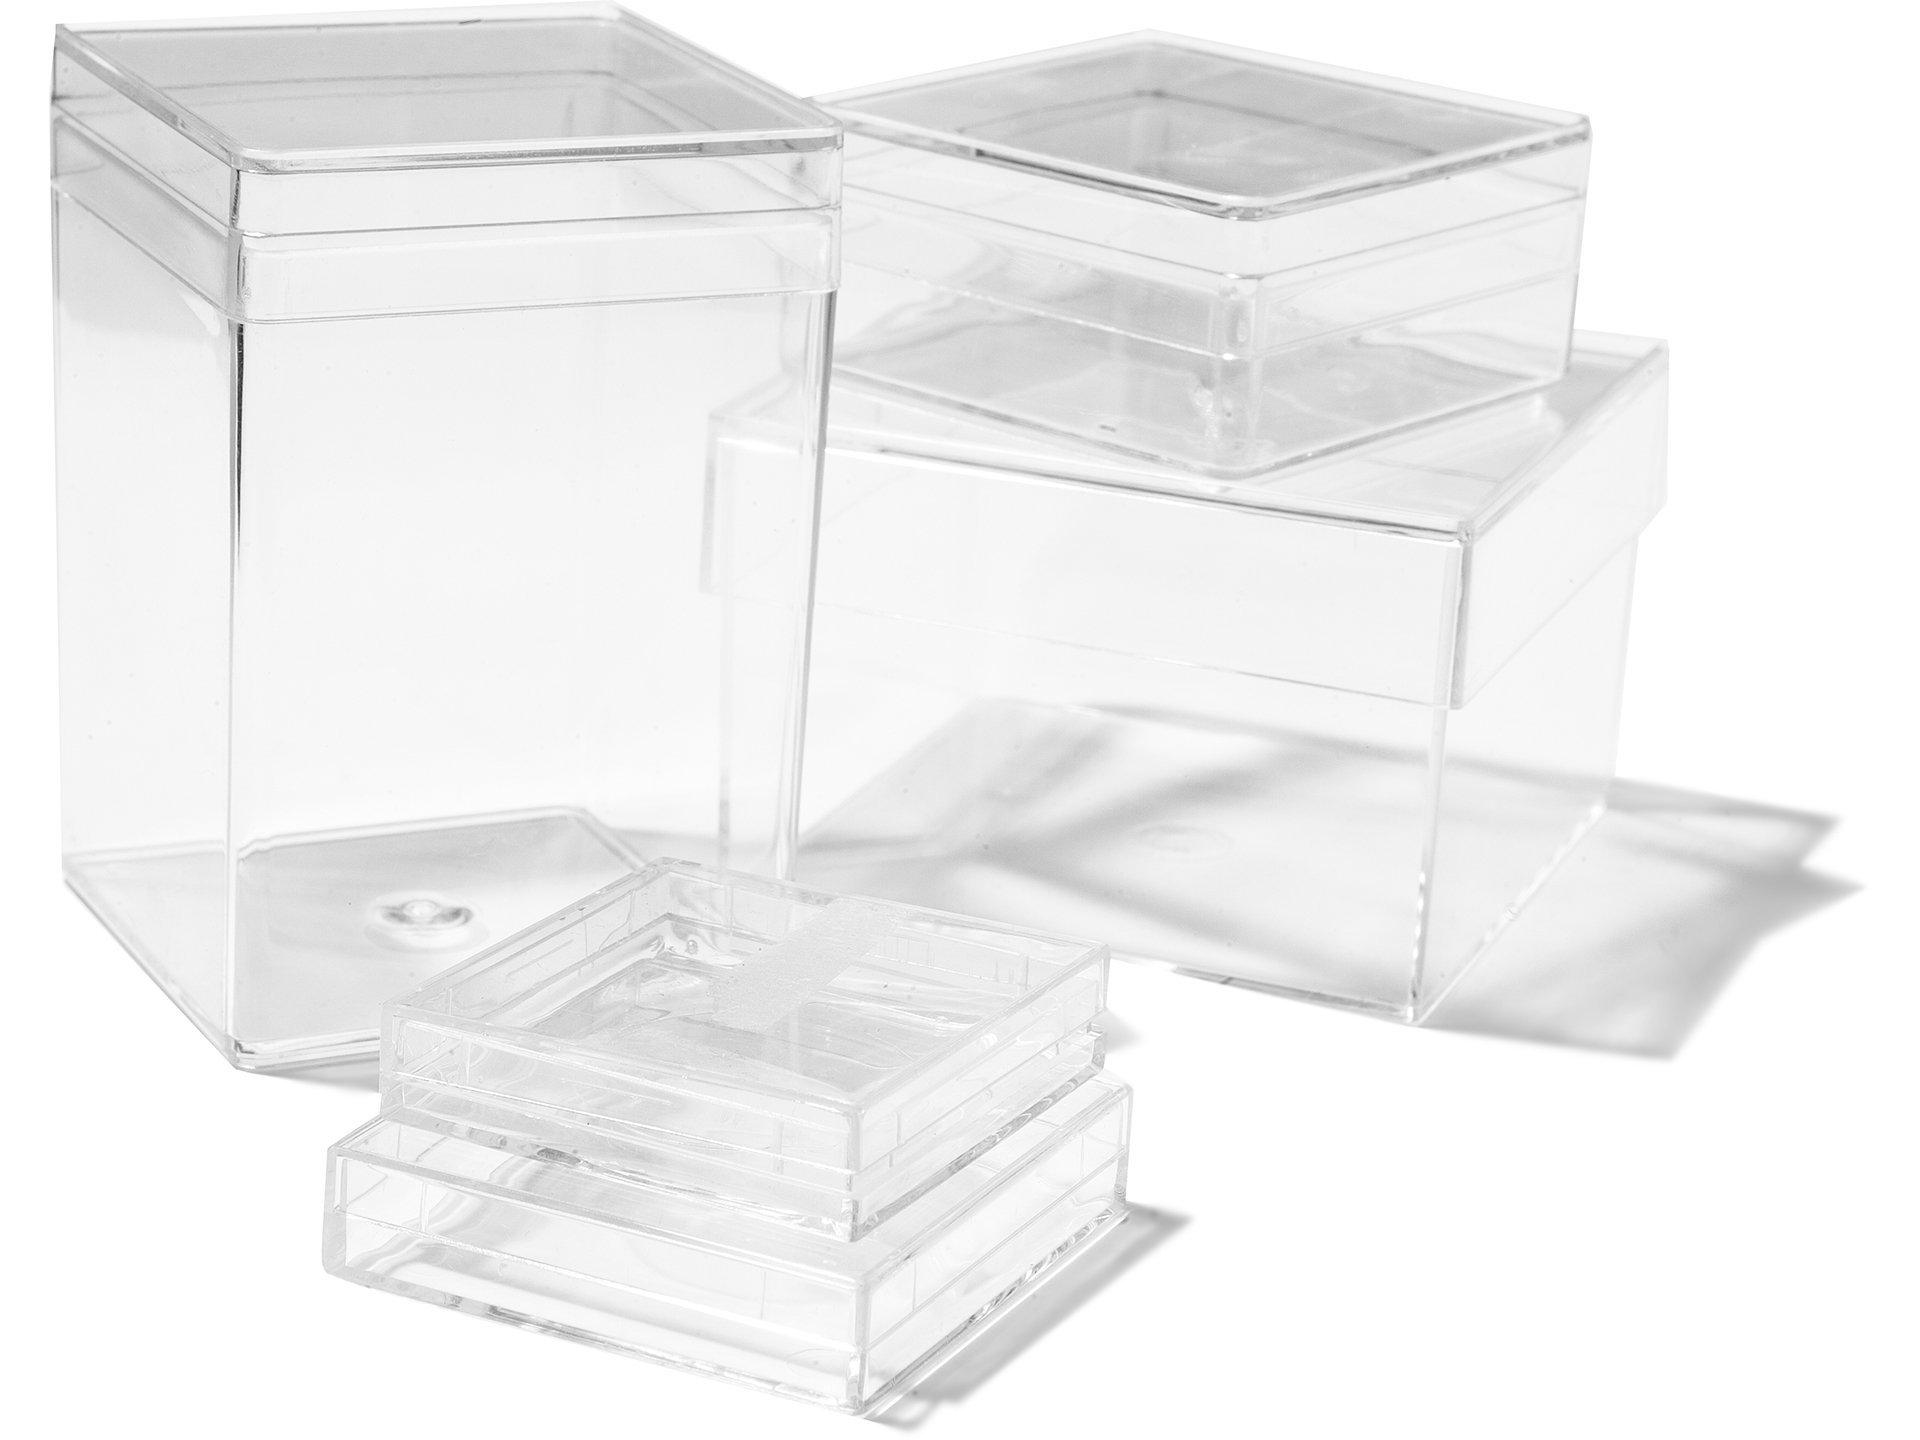 kunststoffdosen transparent quadratisch kaufen modulor. Black Bedroom Furniture Sets. Home Design Ideas